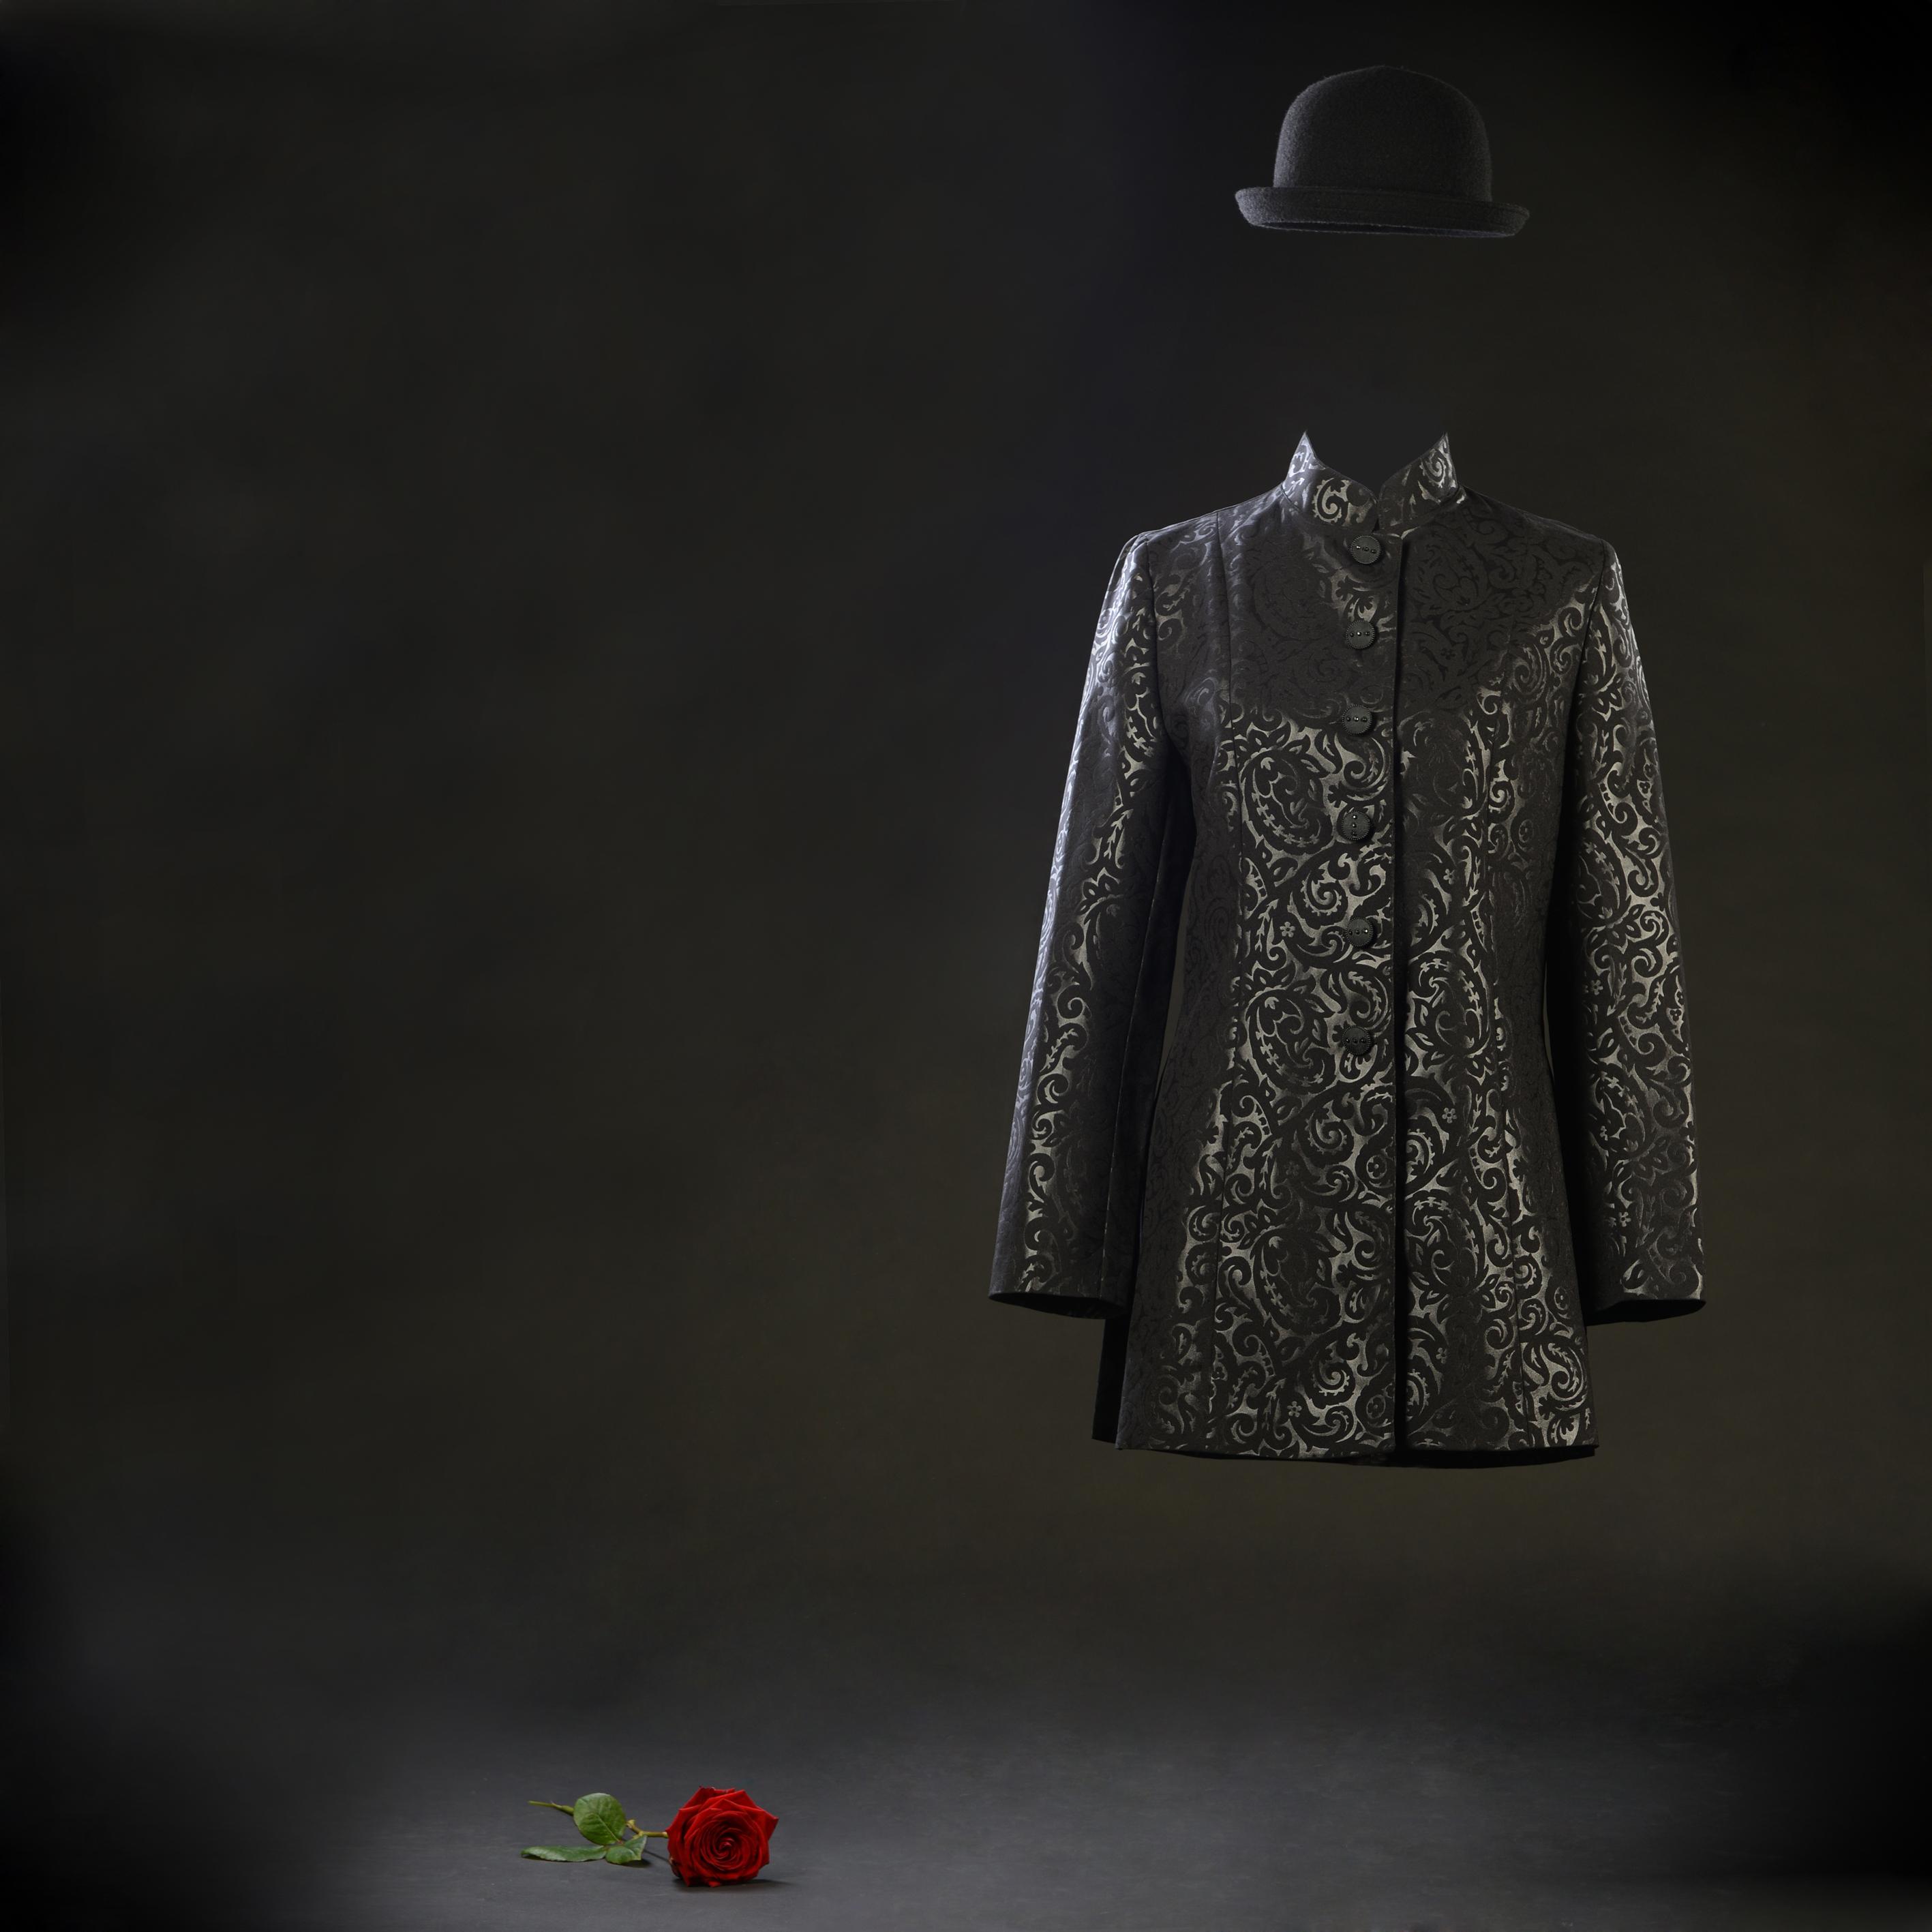 6-fotografie-andrea-rompa-lichtbildwerkstatt-business